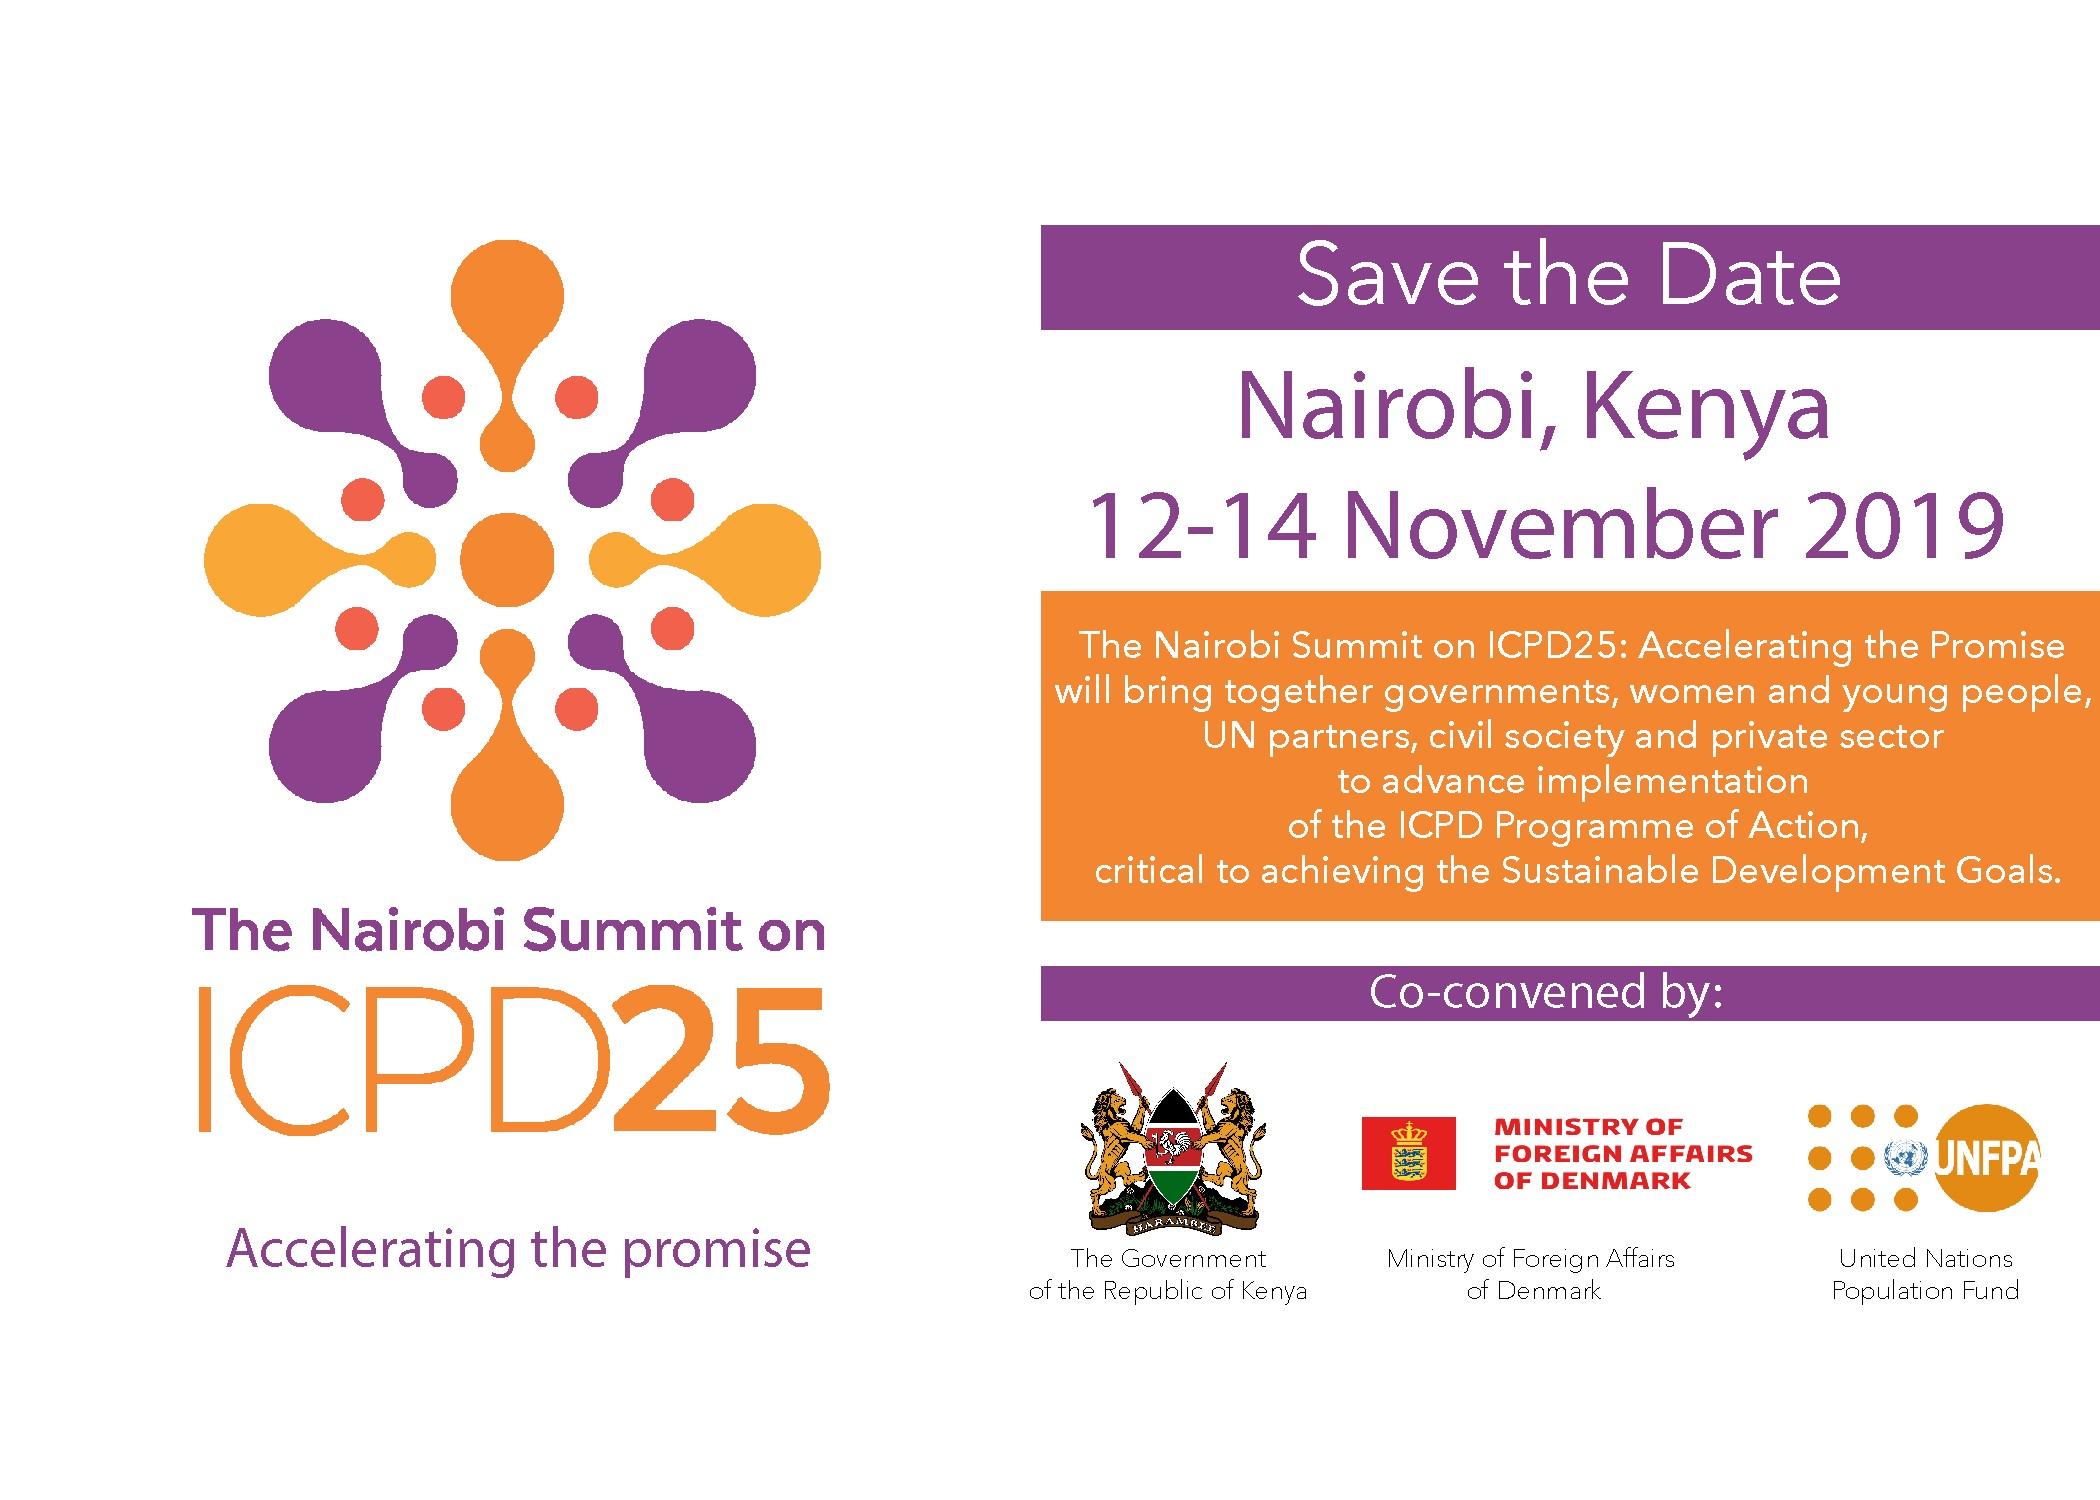 [Image: Countdown 2030 Europe provides inputs to Nairobi Summit Global Commitments]